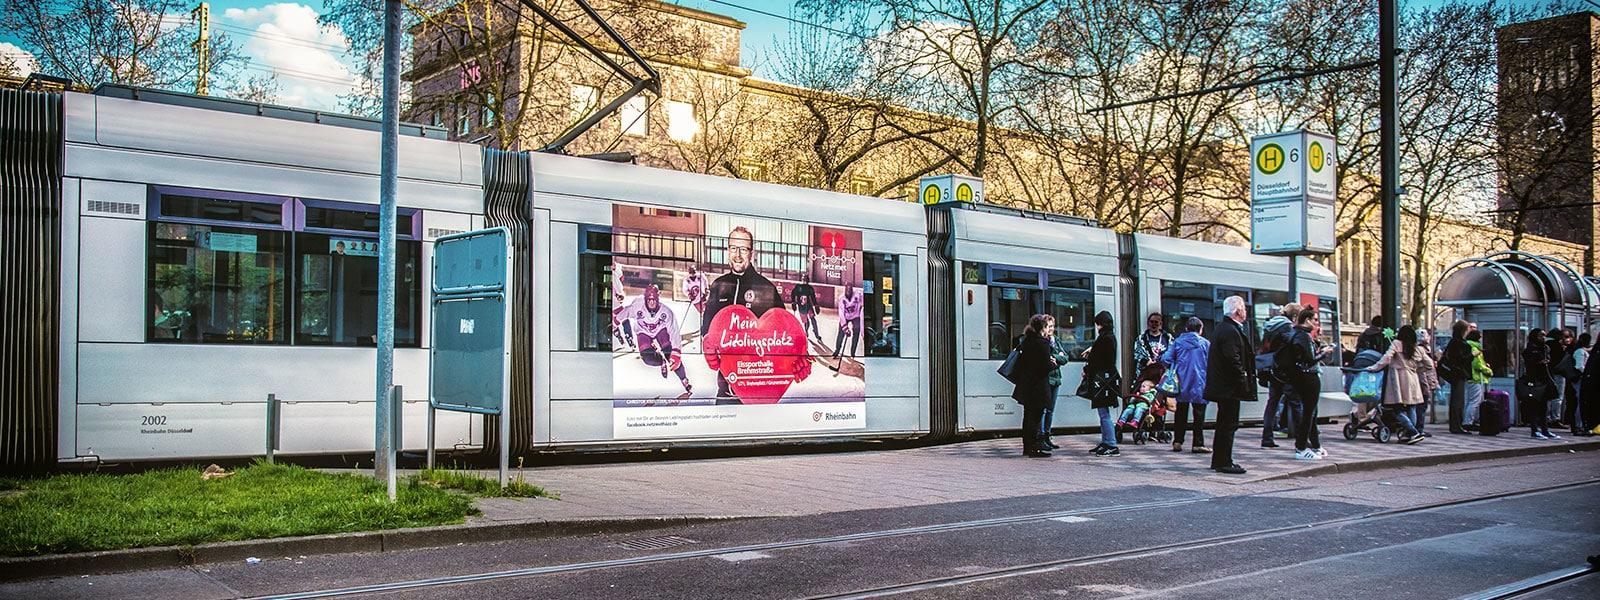 Hamburg-Verkehrsmittelwerbung-Bahn-Traffic-Board